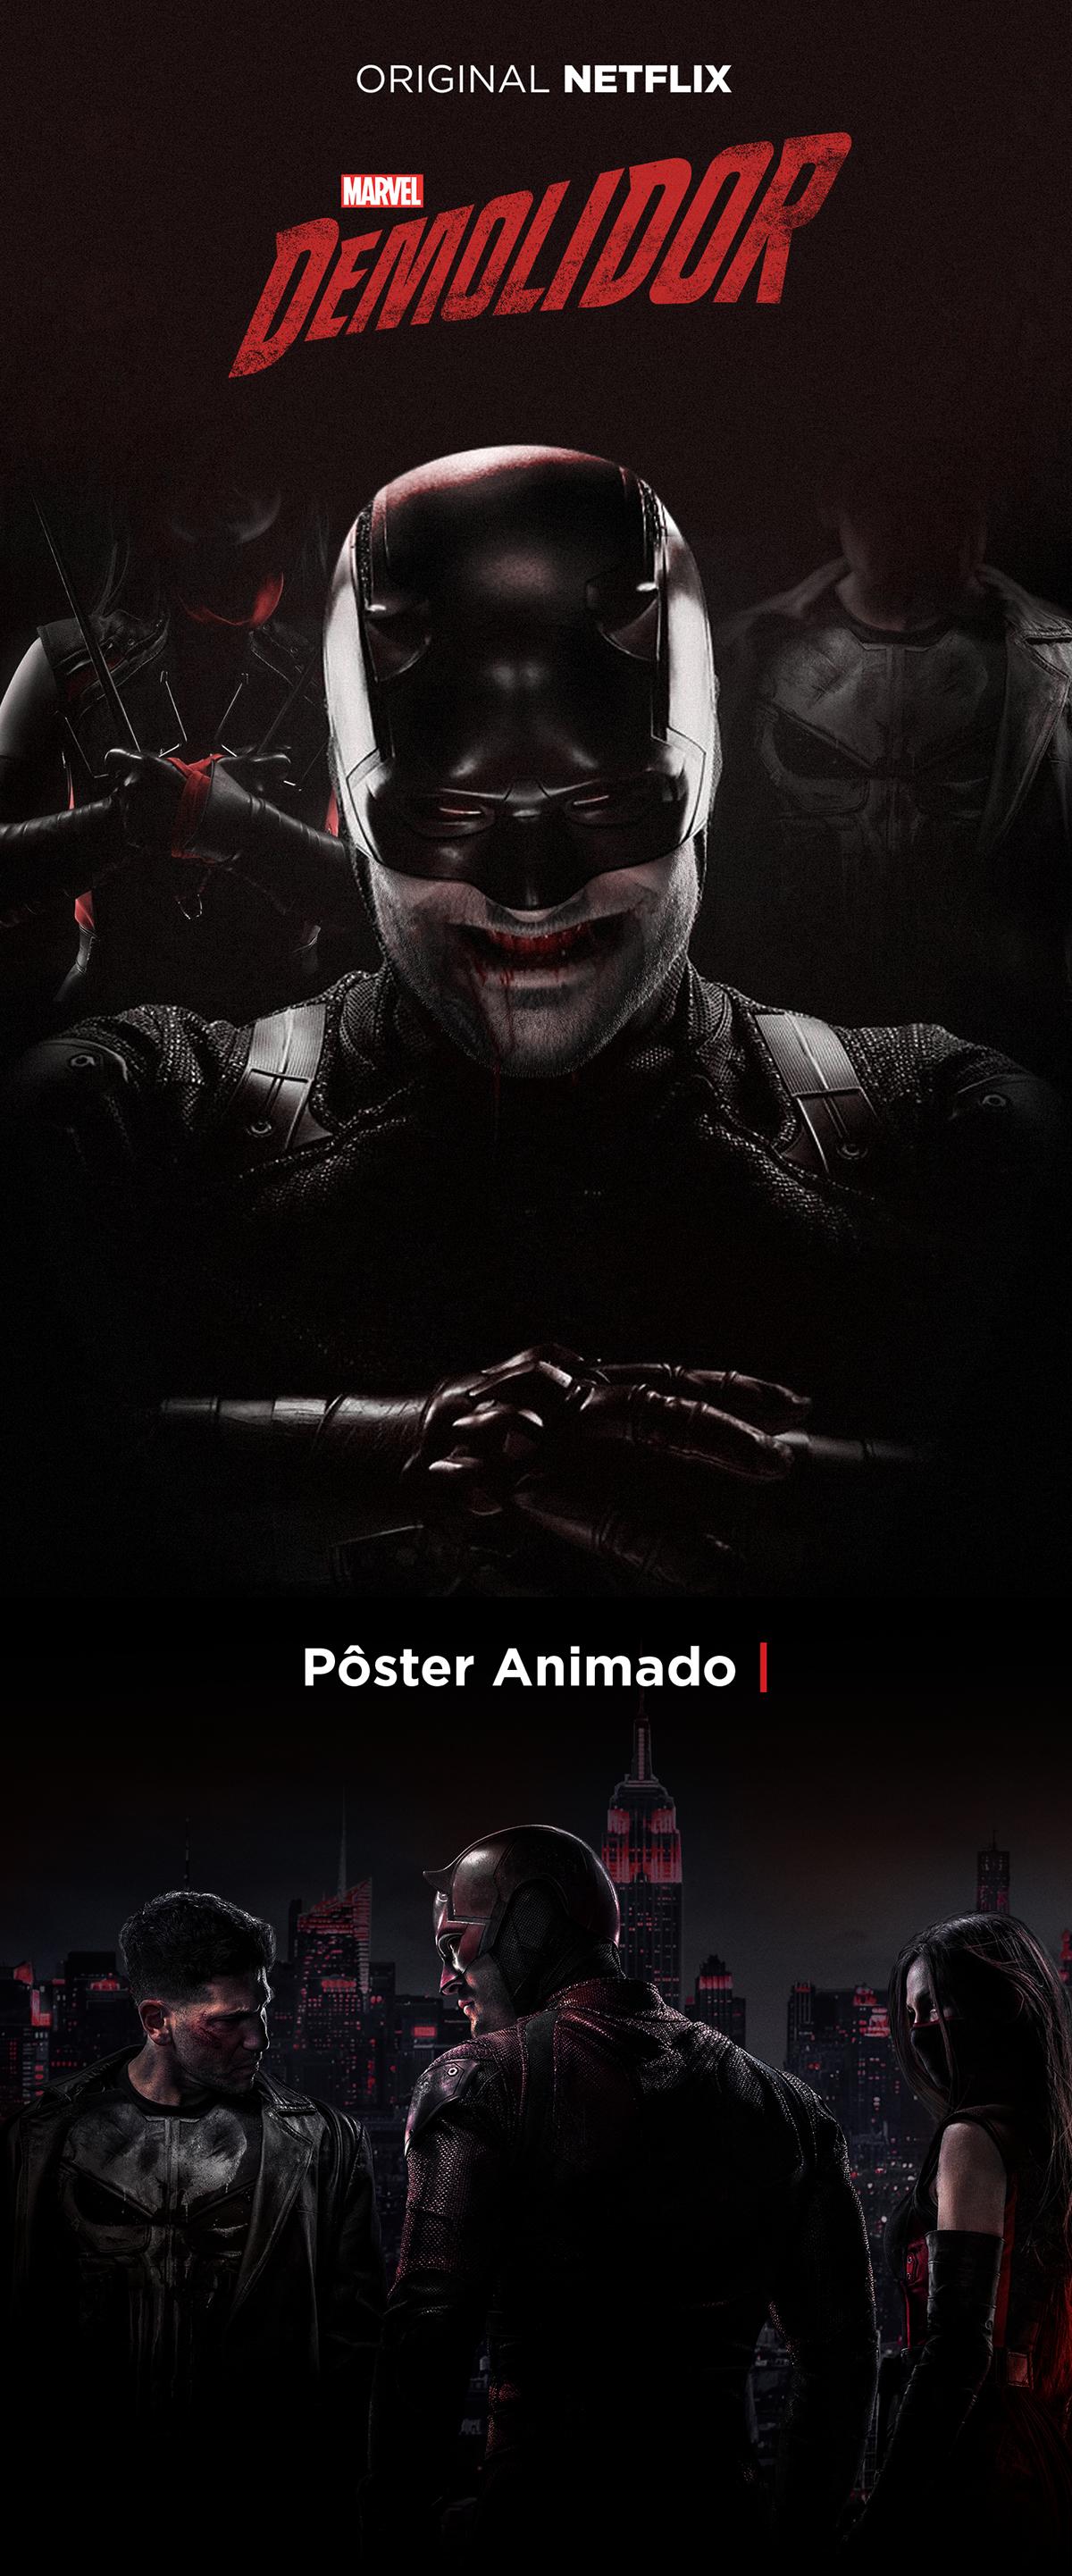 Netflix Daredevil Animated Movie Poster - Brazil on Pantone